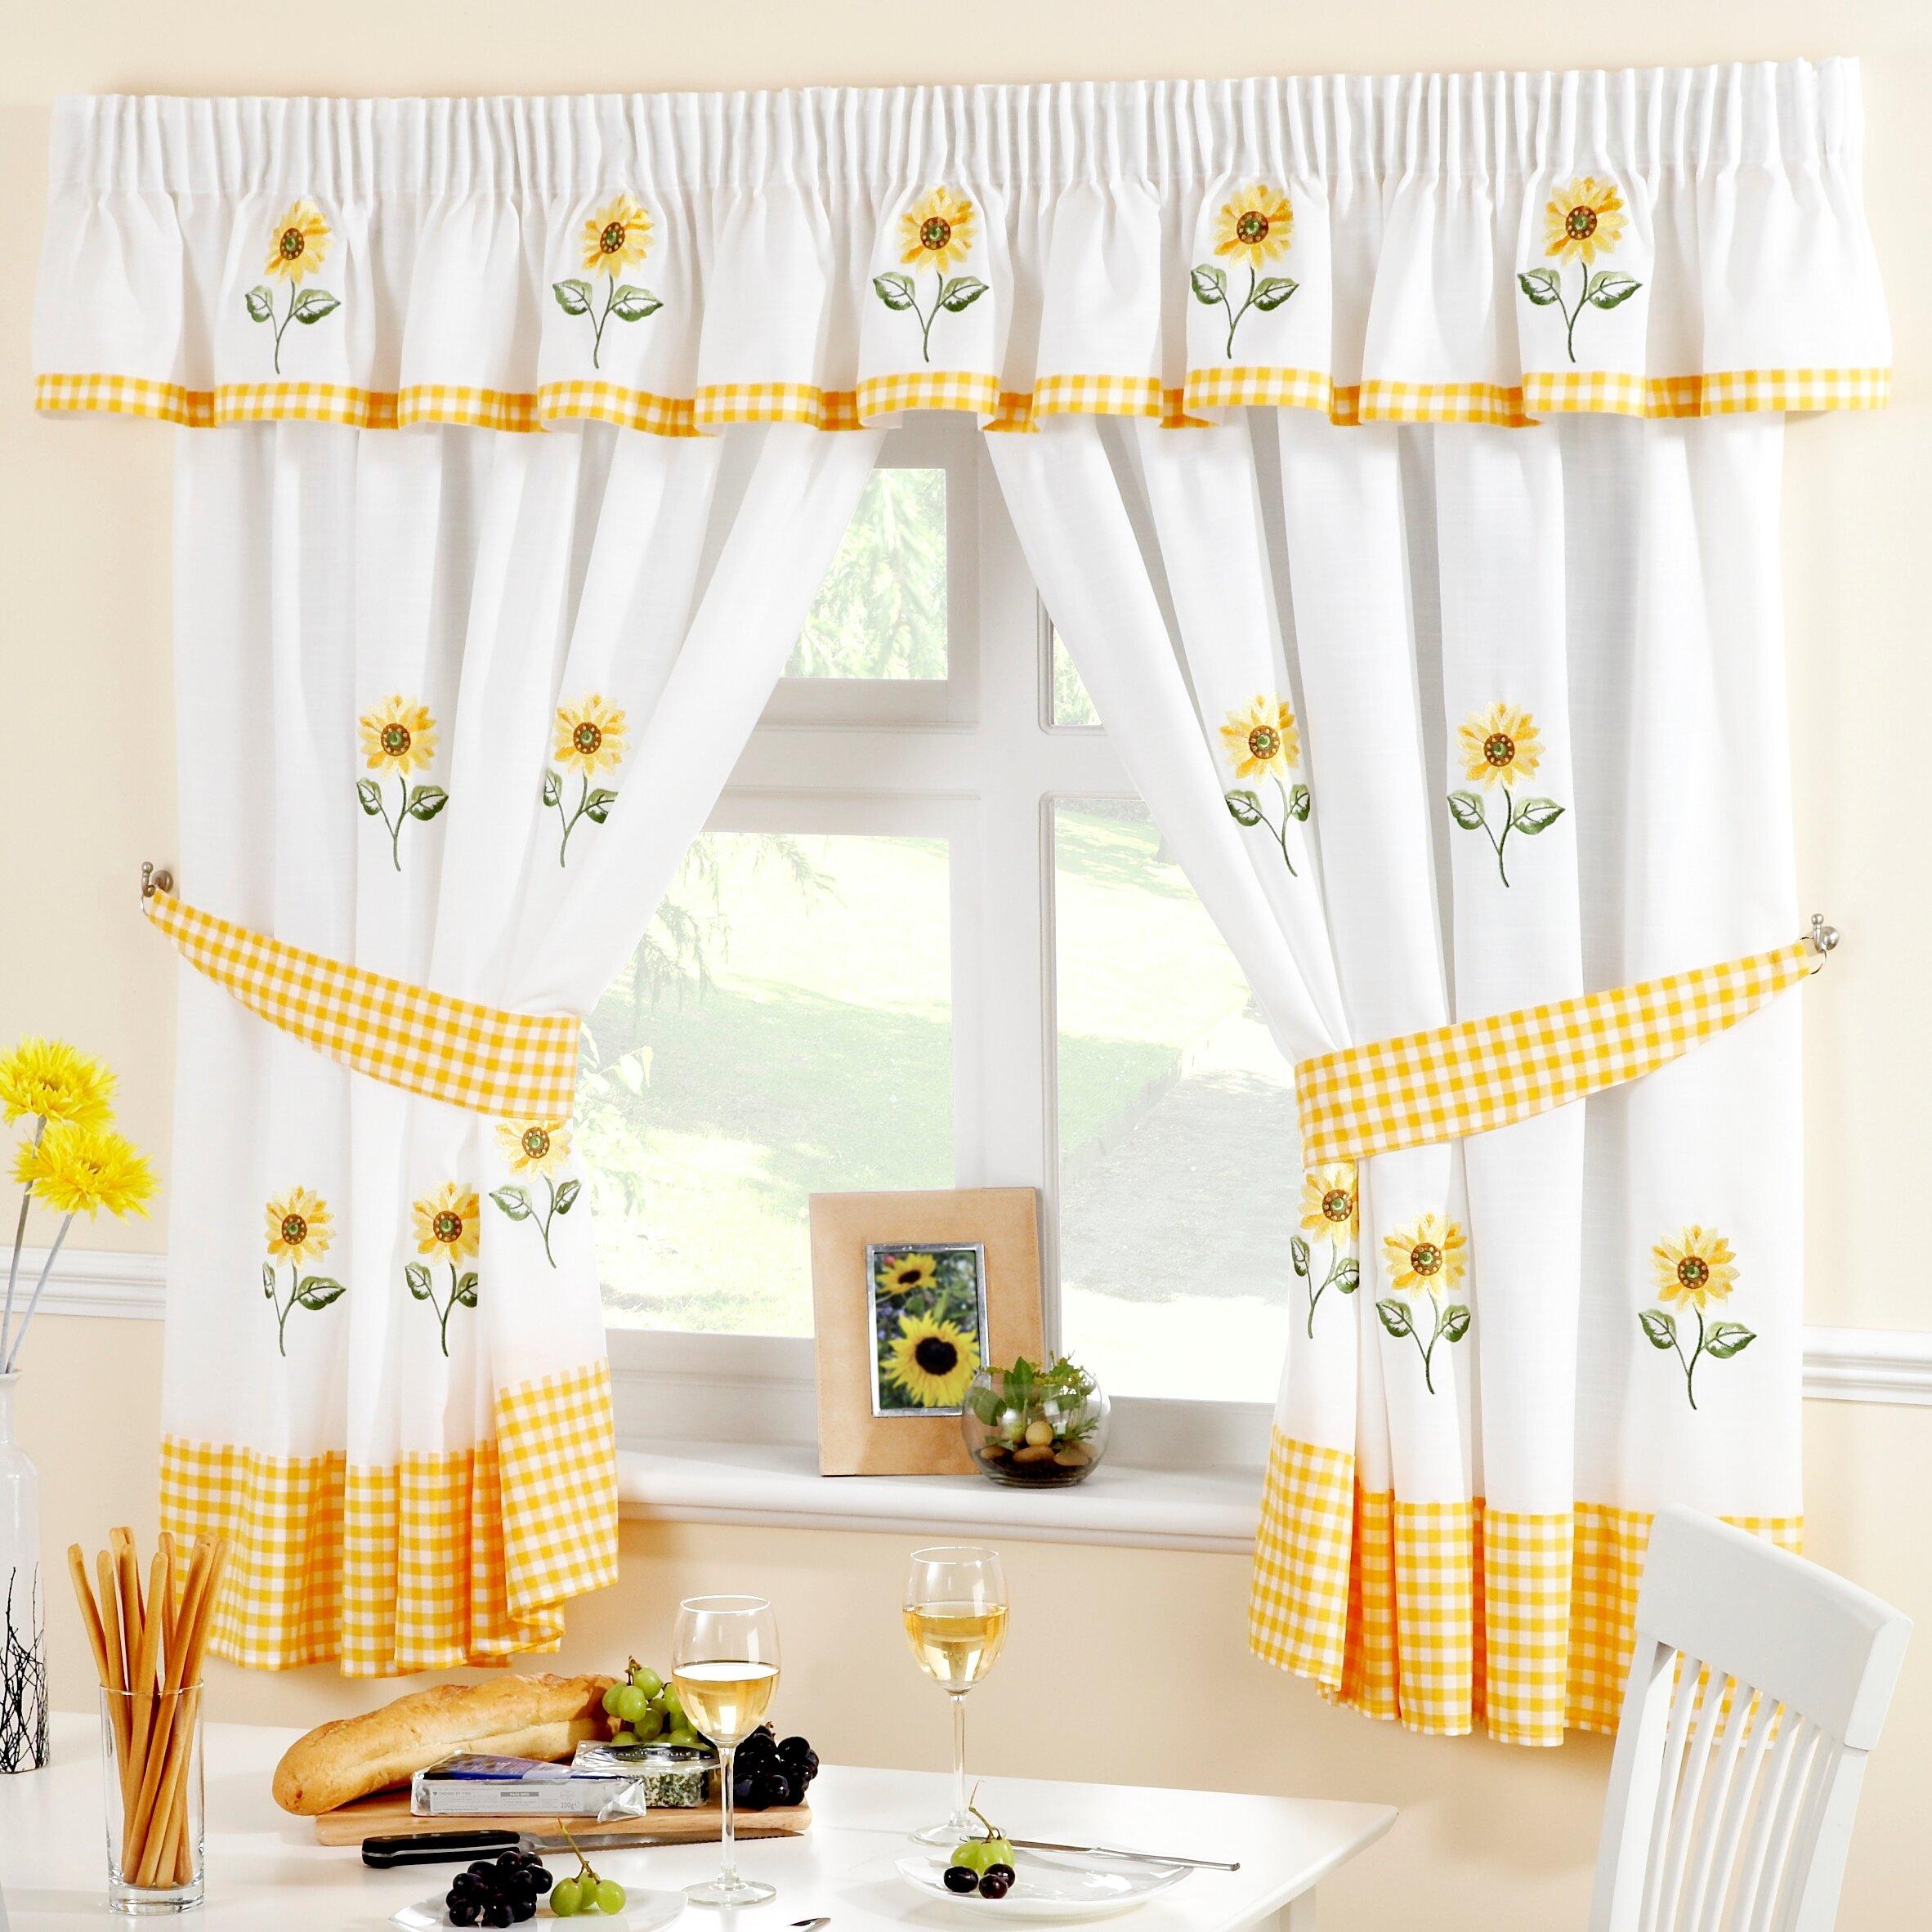 Home Essence Gardine Sonnenblumen mit Ösen (1 Stück)   Wayfair.de